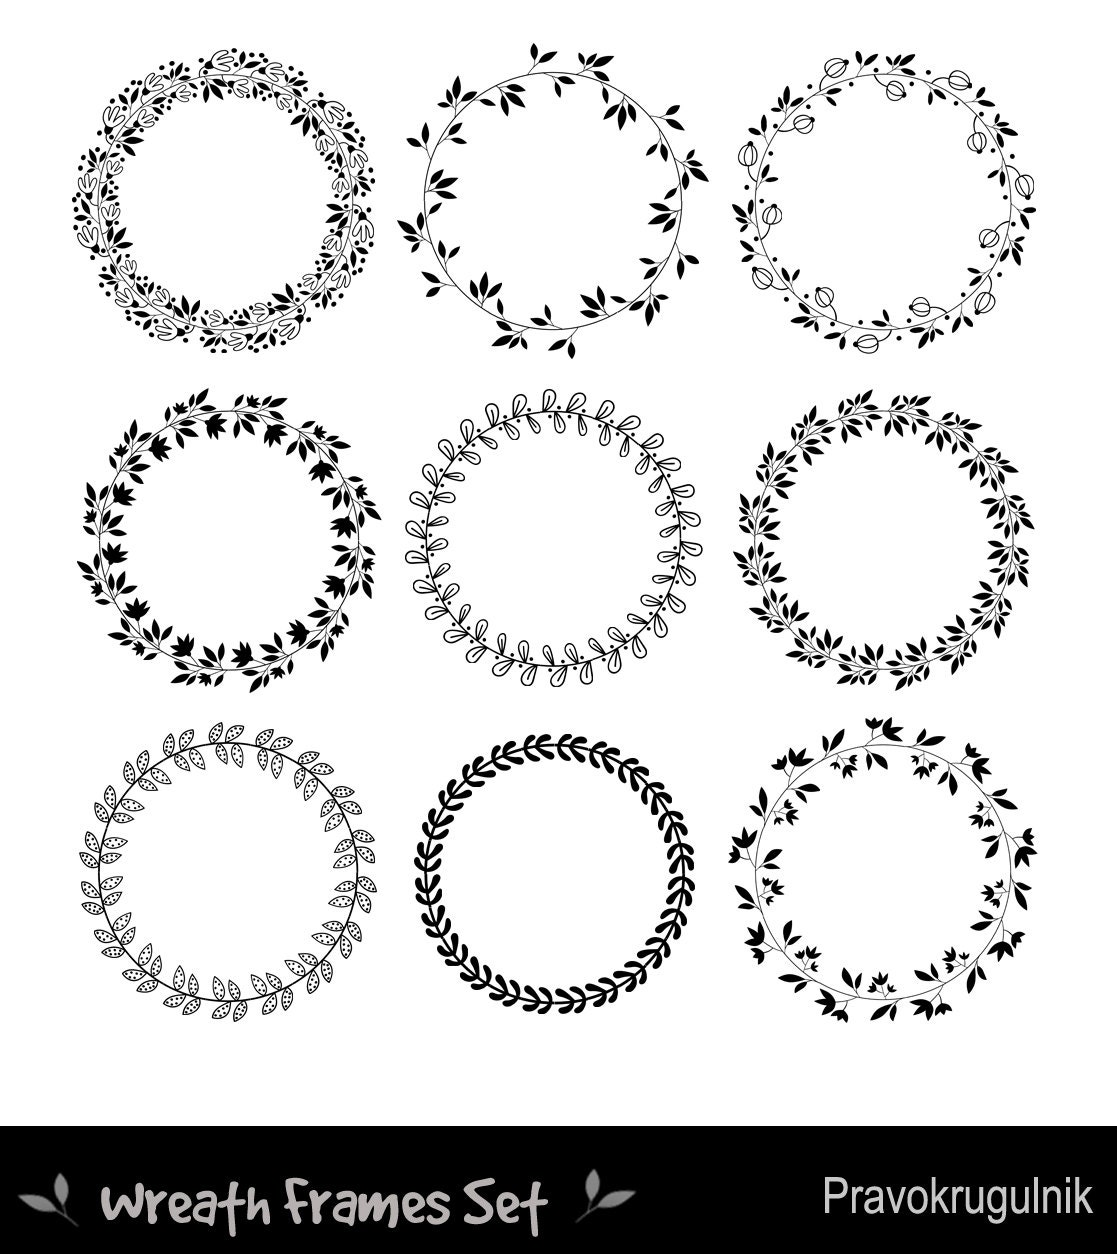 Runde Rahmen Clipart Blumenkränzen Clipart Kreis Rahmen | Etsy